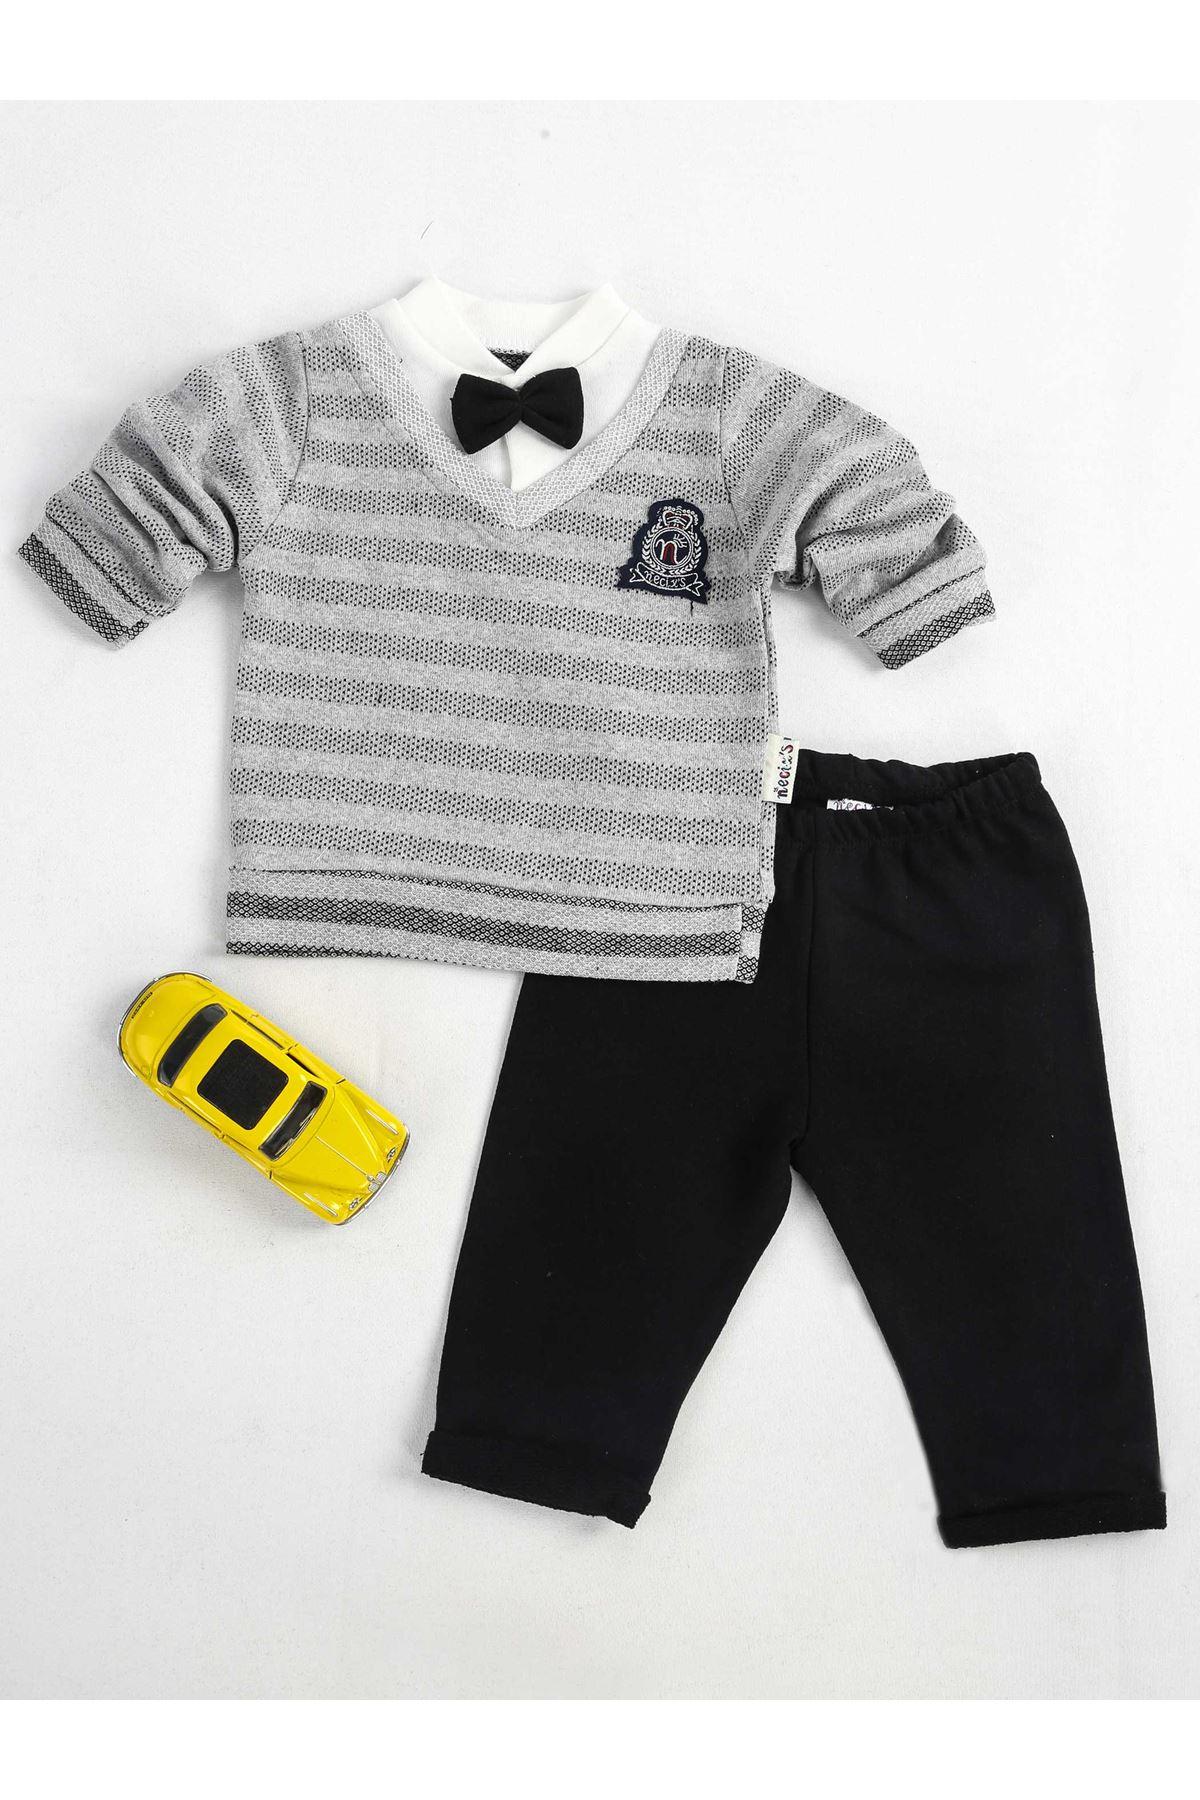 Gri Siyah Erkek Bebek 2 li Takım